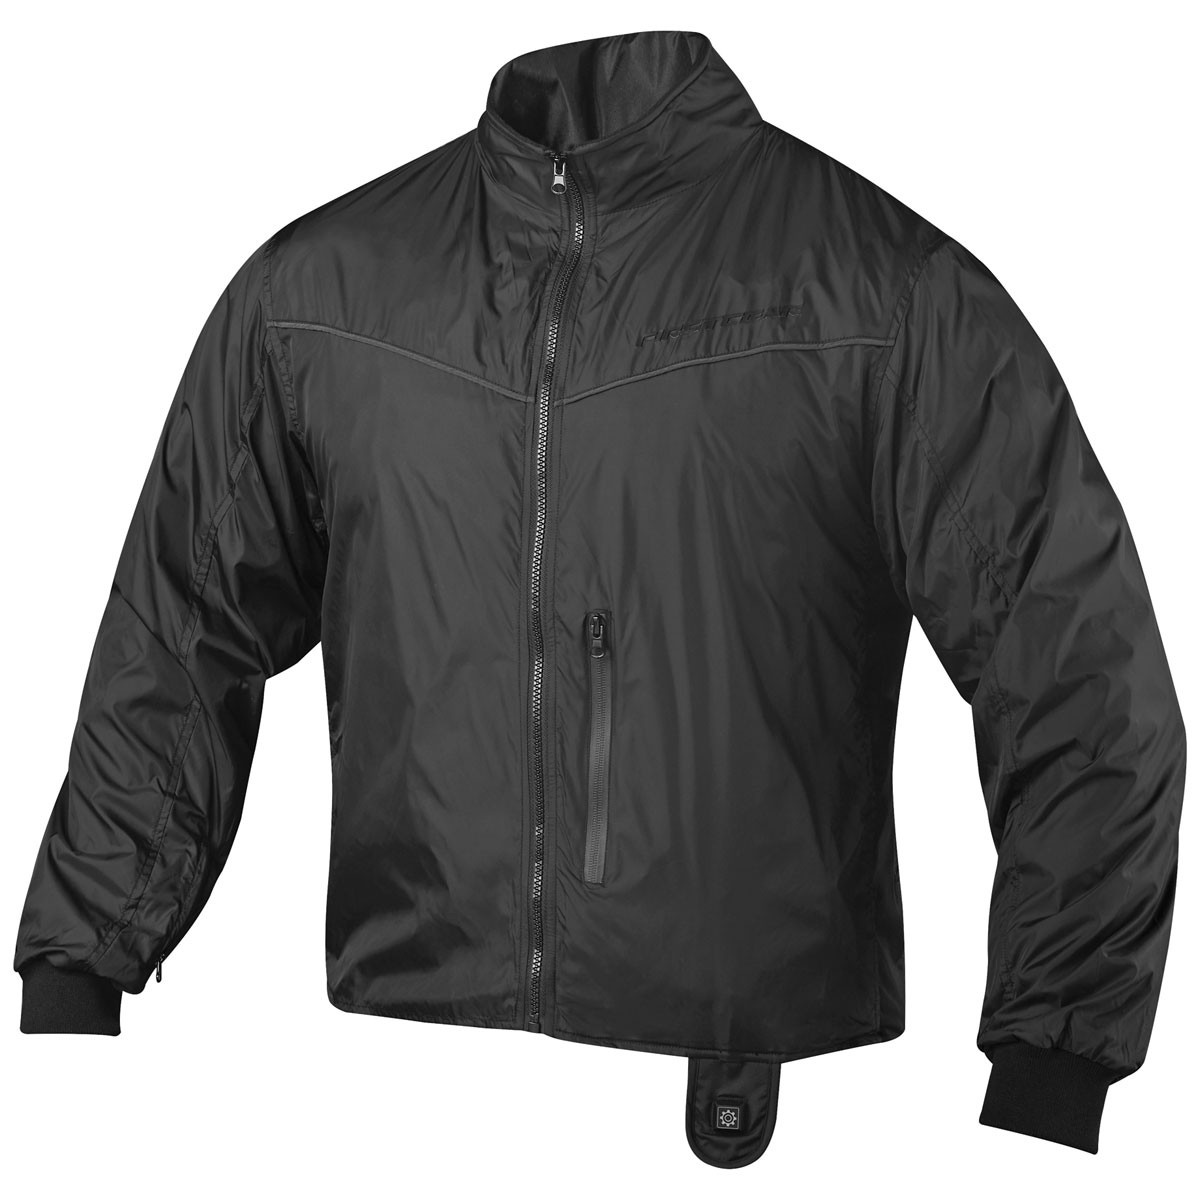 Firstgear Women's 12v Heated Jacket Liner